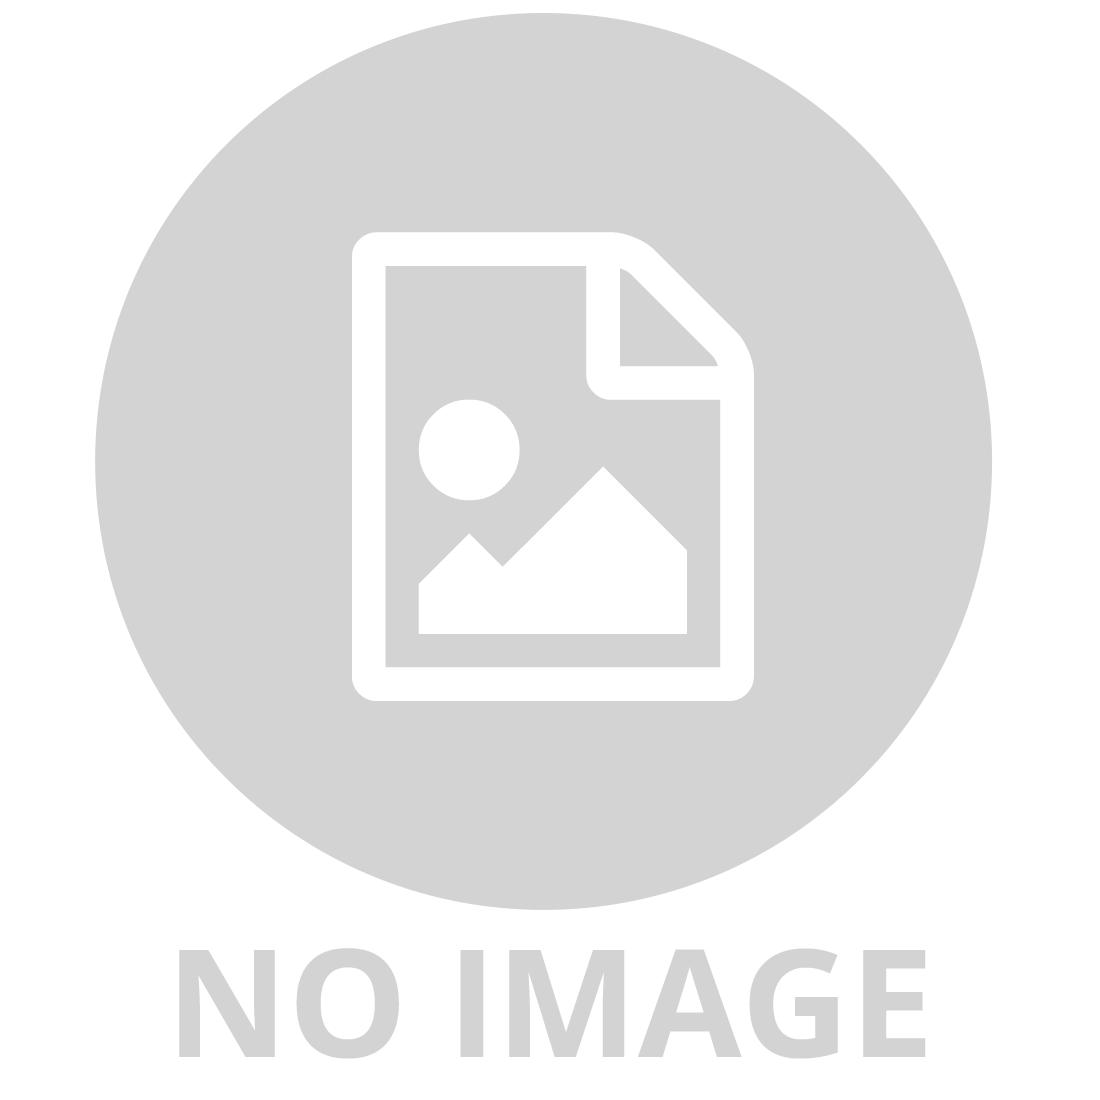 TAMIYA TS-26 PURE WHITE SPRAY PAINT FOR PLASTICS